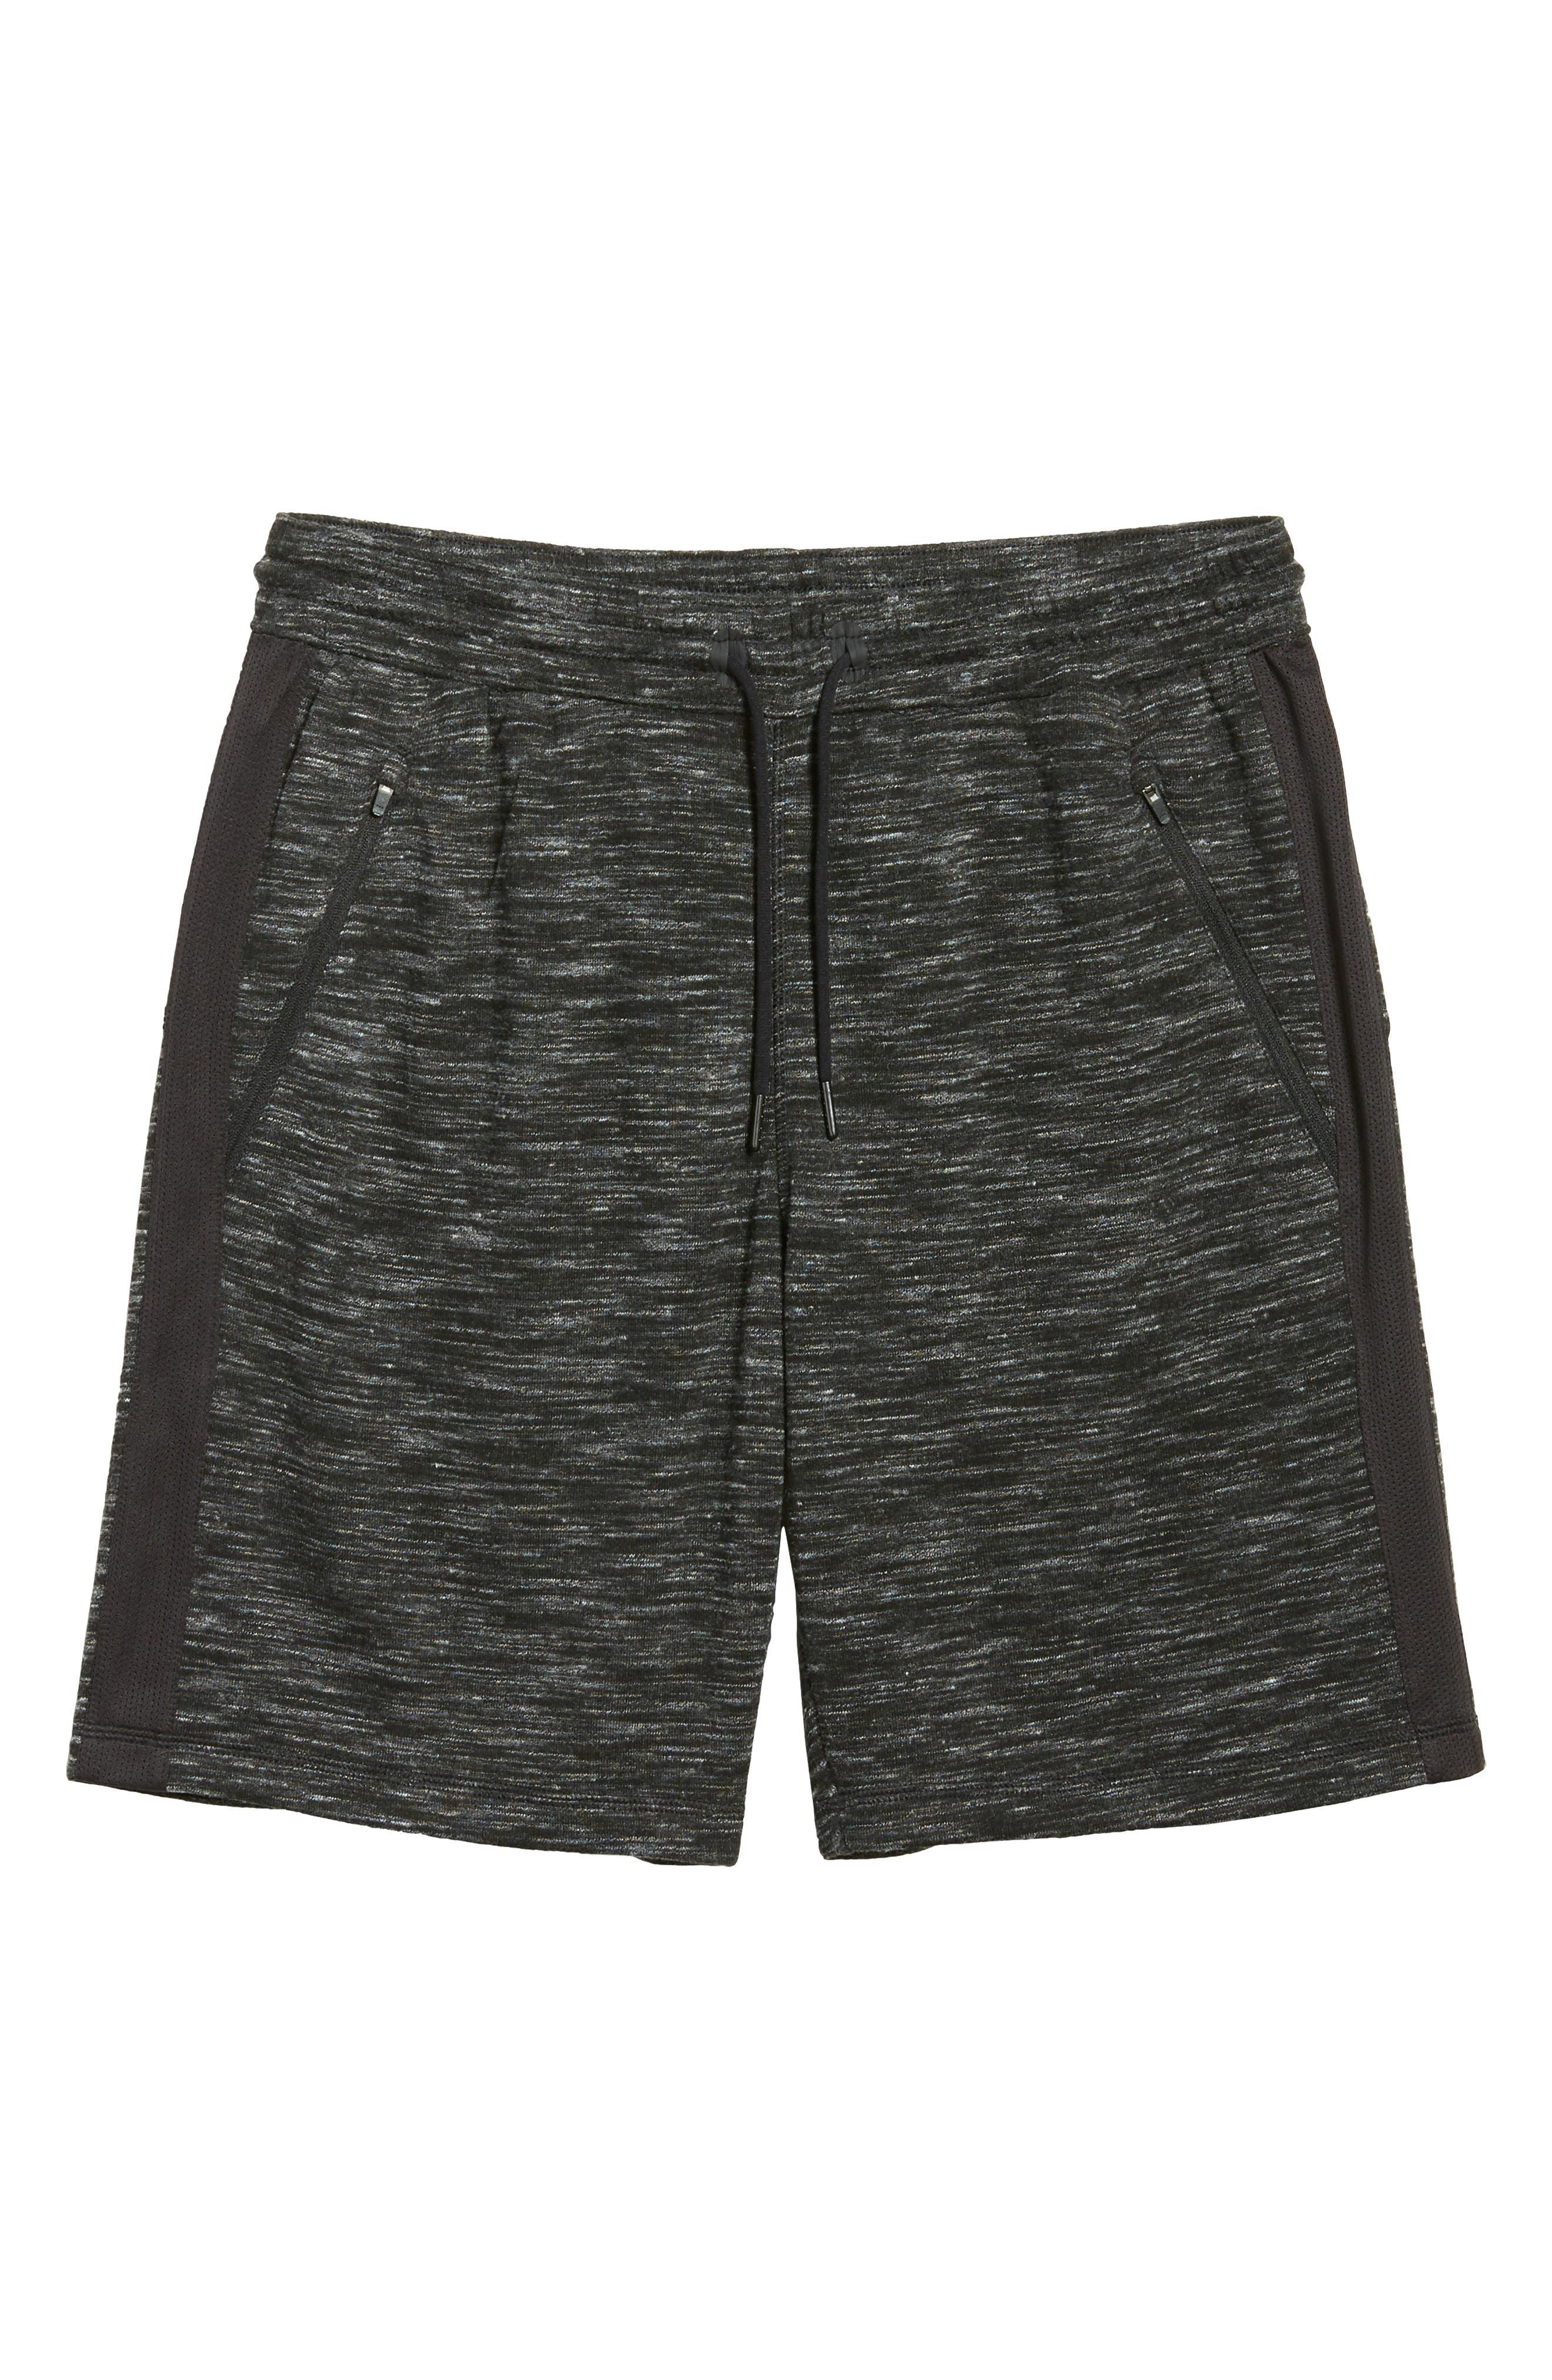 Neptune Terrycloth Shorts,                             Alternate thumbnail 6, color,                             001